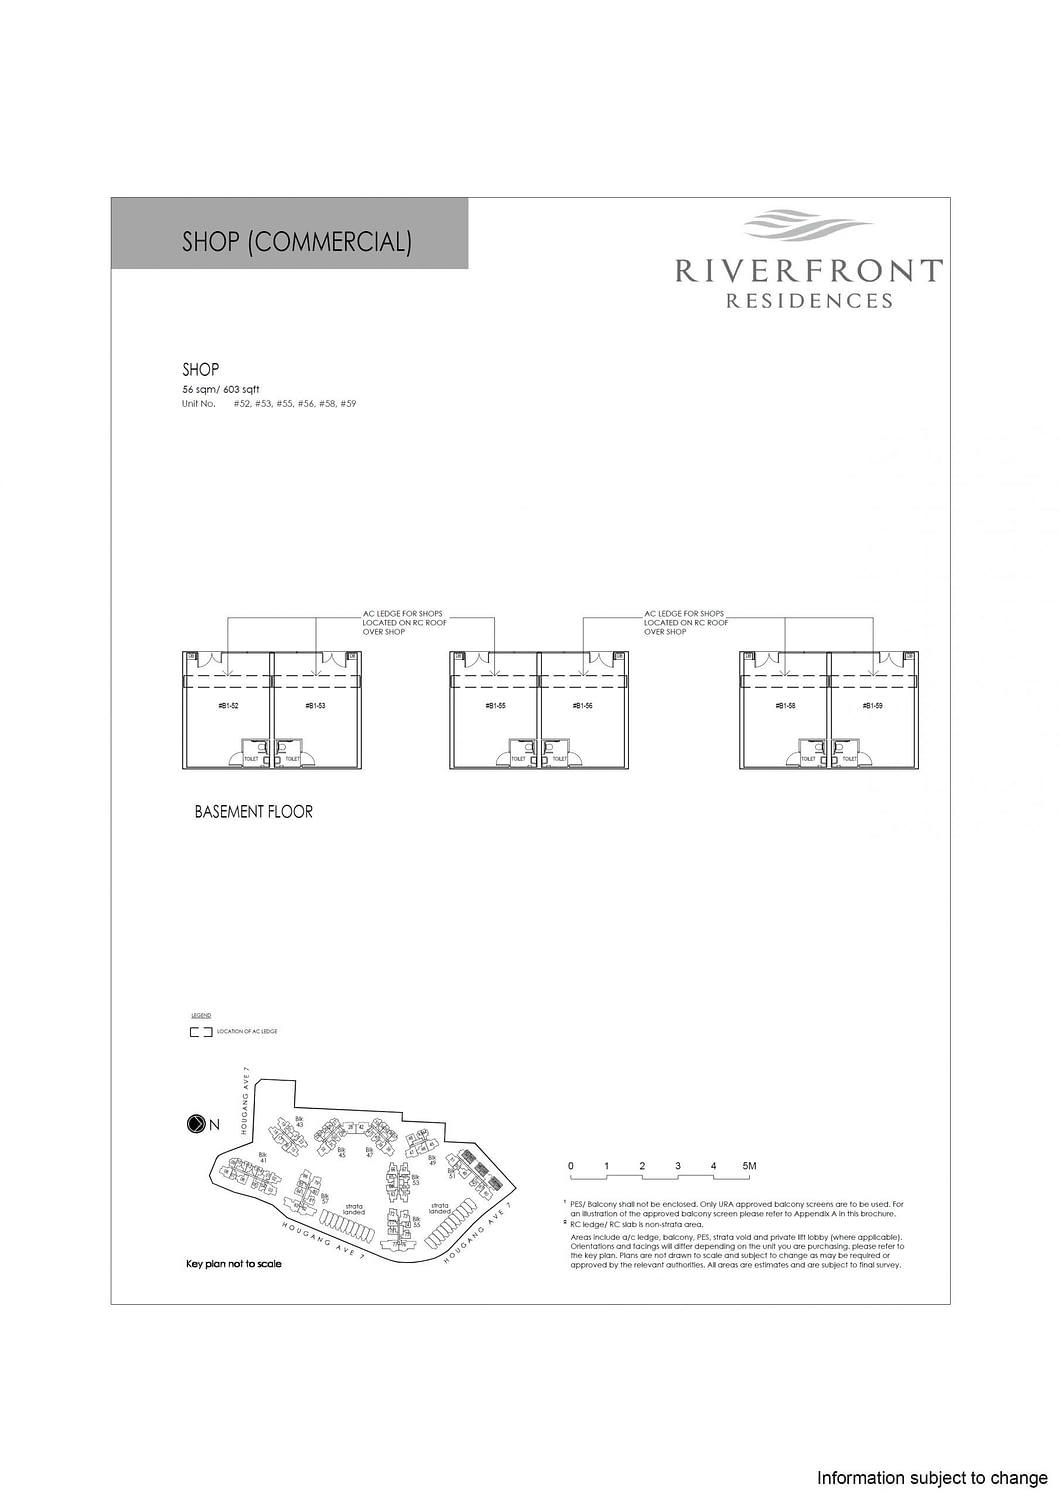 Riverfront Residences Riverfront Residences Floorplan SHOP scaled